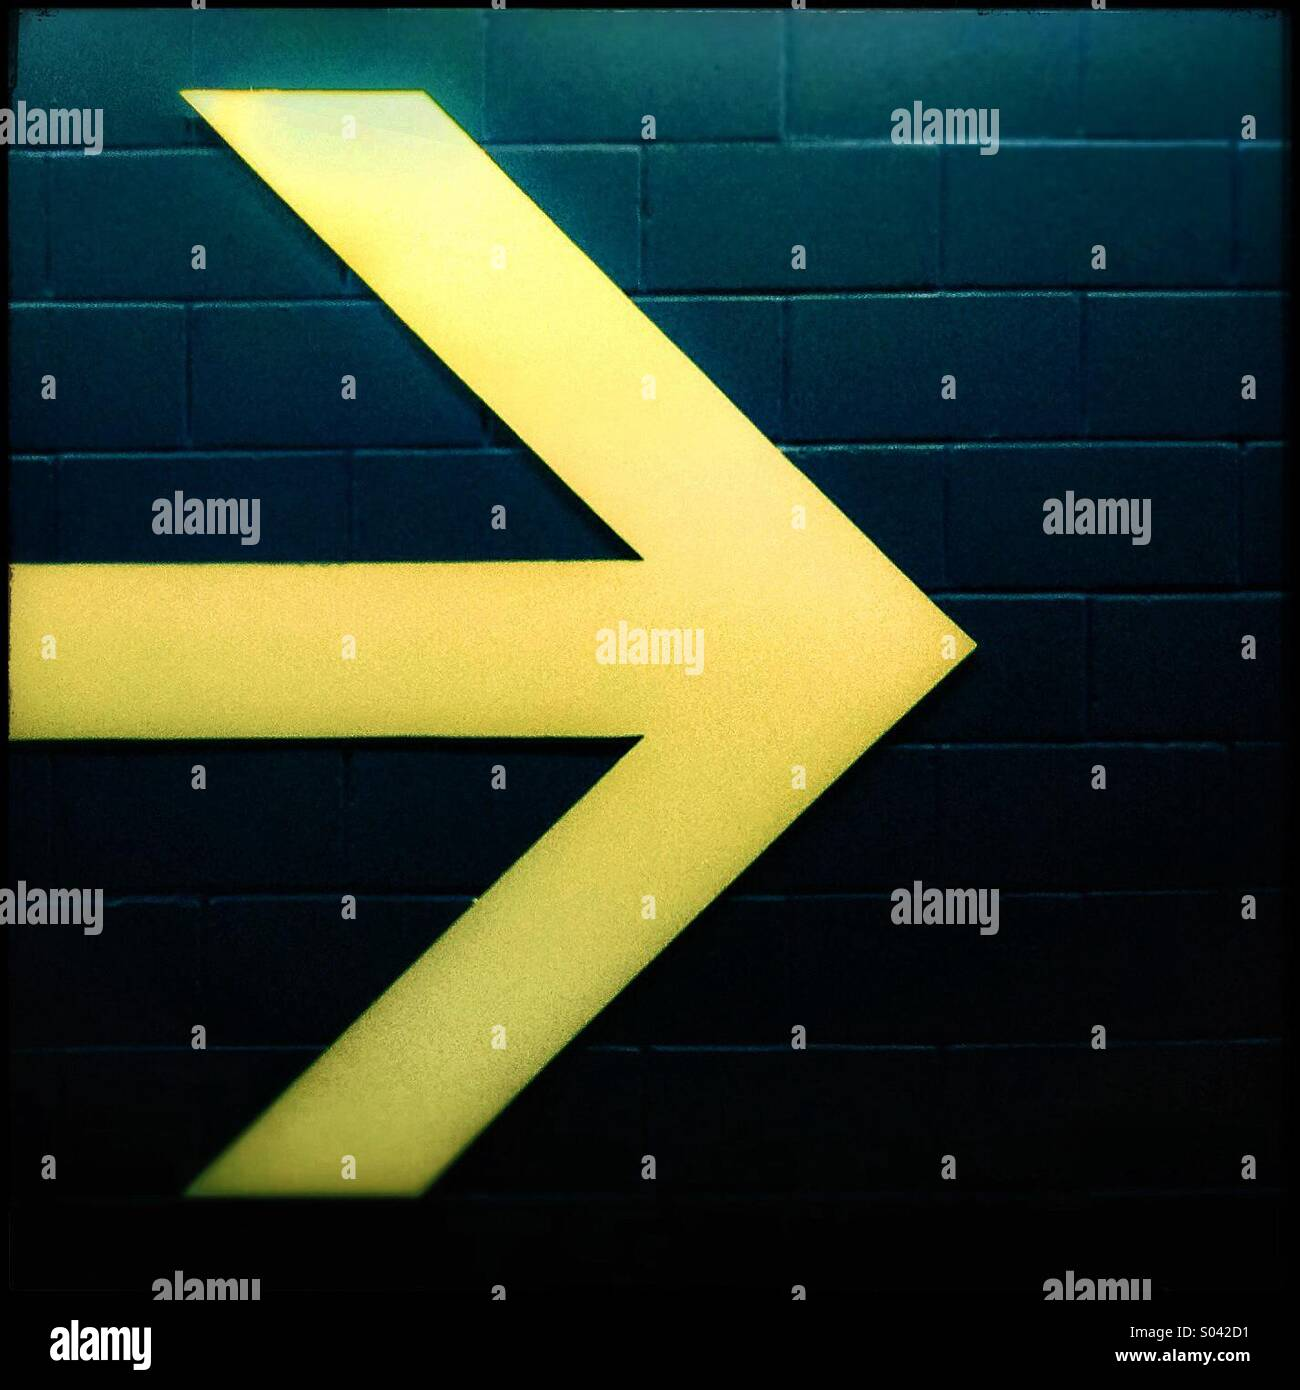 Forward arrow sign - Stock Image